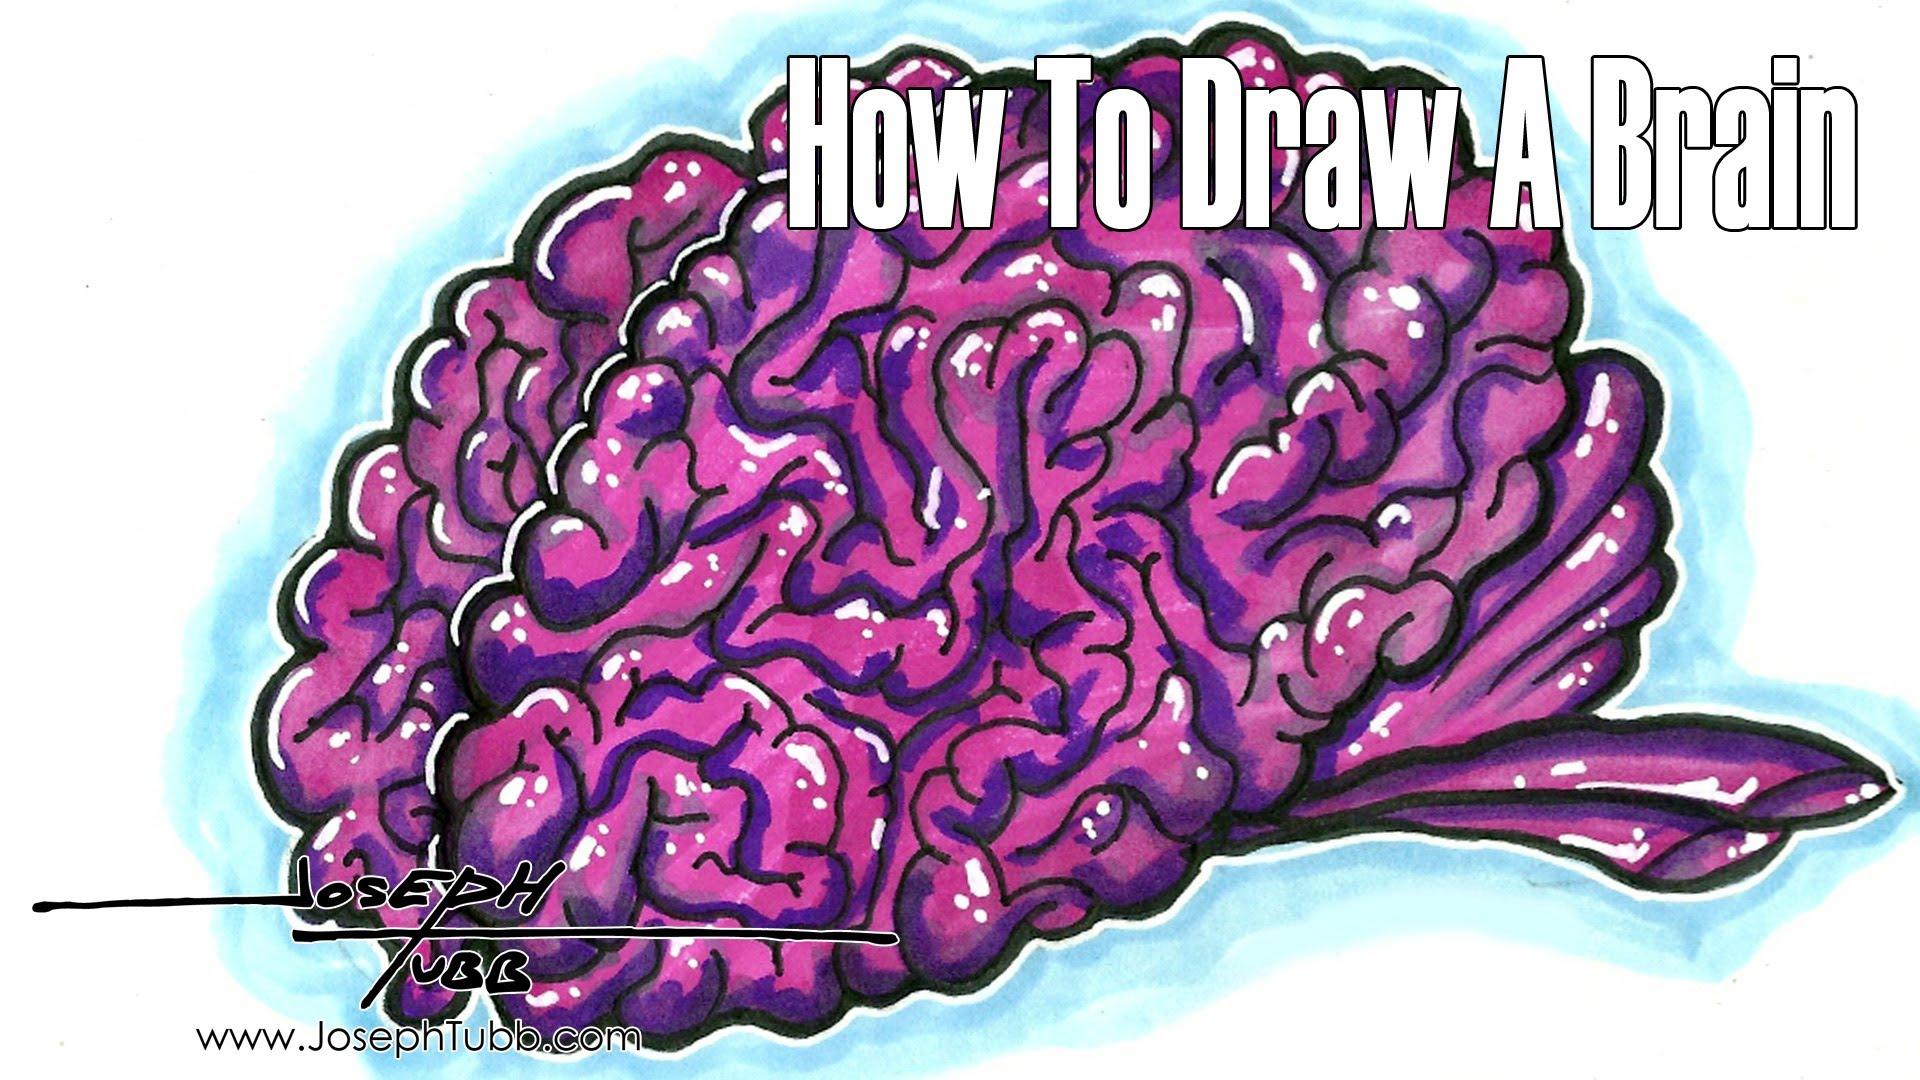 Drawn brains graffiti Brain  To Draw YouTube